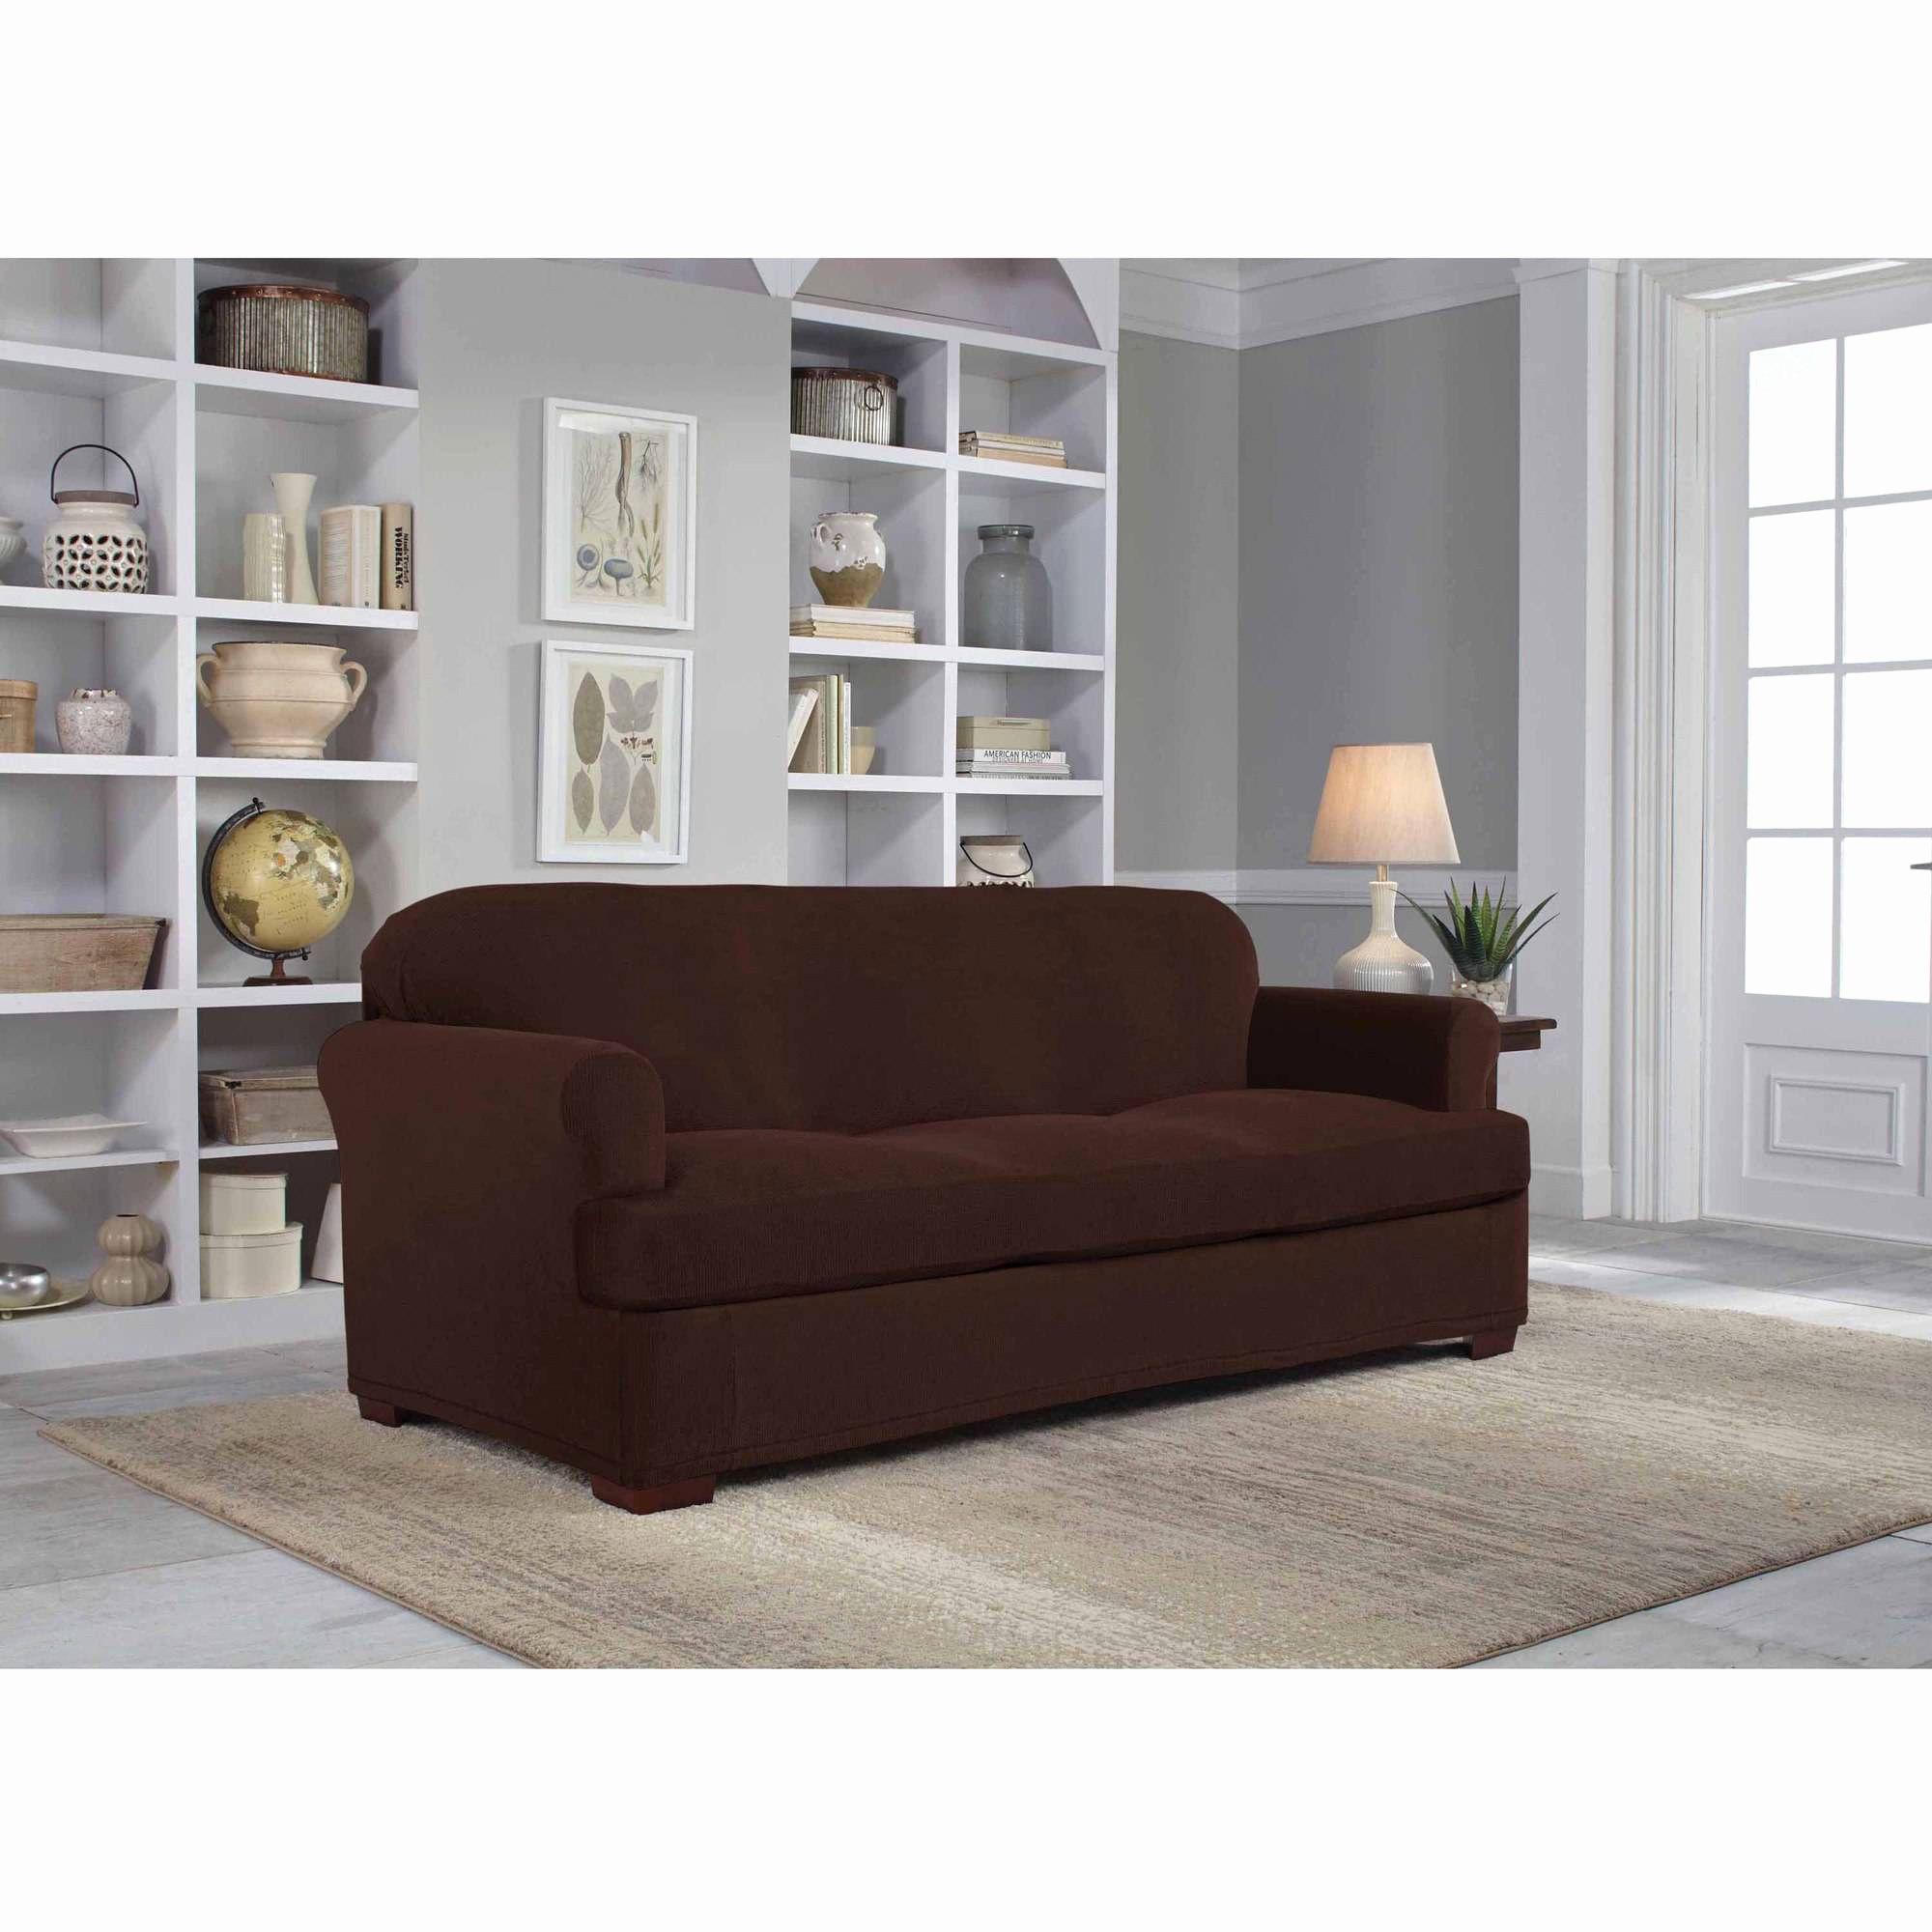 Inspirational Gray Sofa Cover Image Serta Stretch Grid Slipcover 2 Piece T Cushion